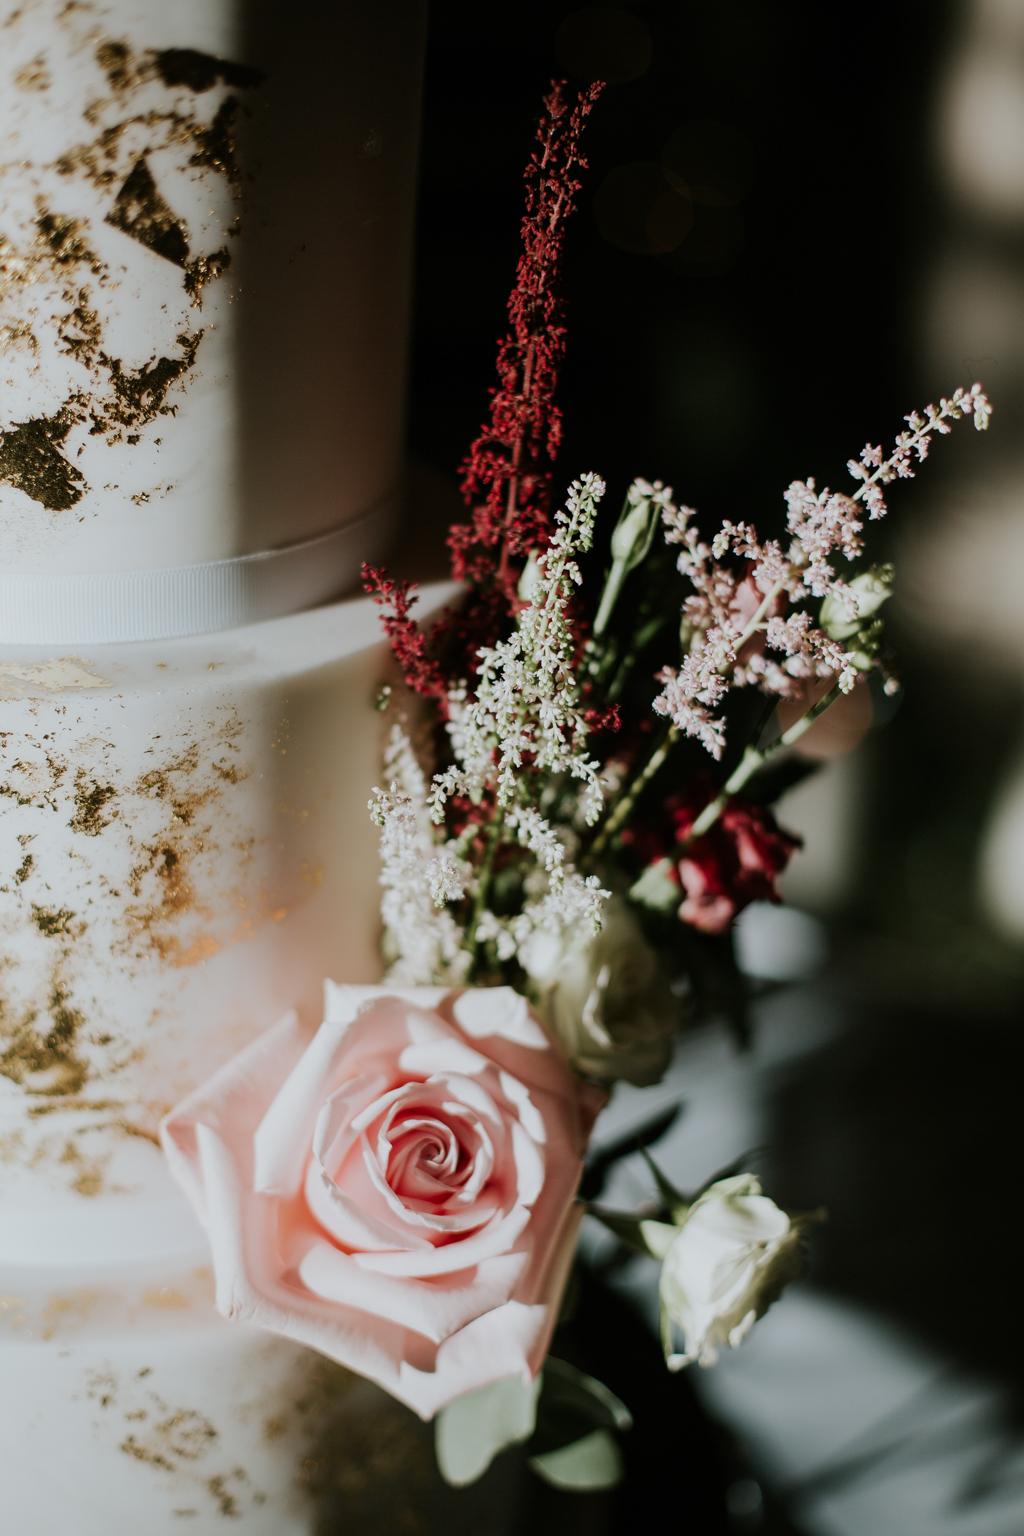 Creative wedding cake for the alternative wedding couple